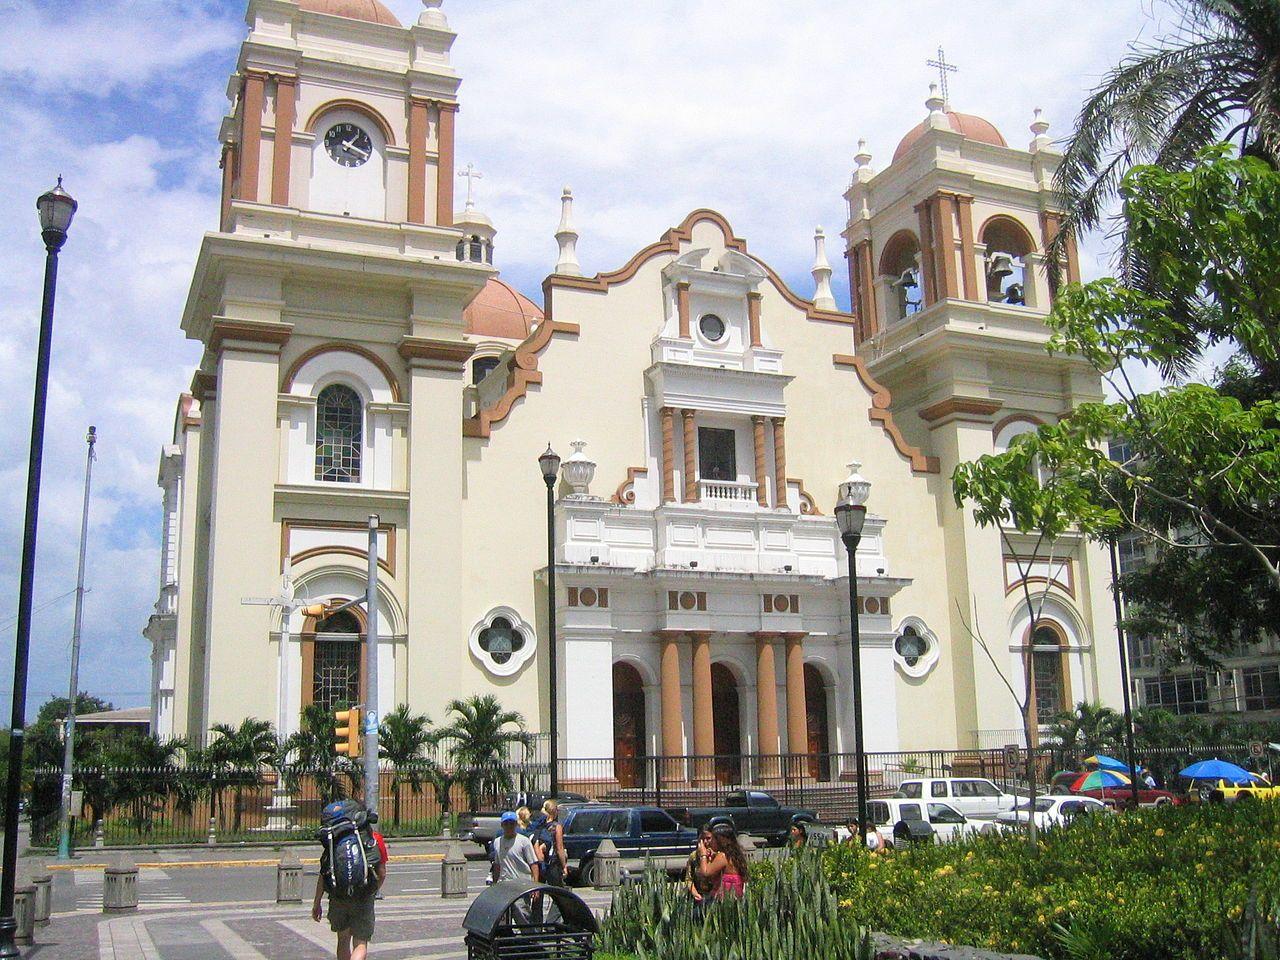 Pin Von Gisele 2 Auf Honduras In 2020 San Pedro Sula